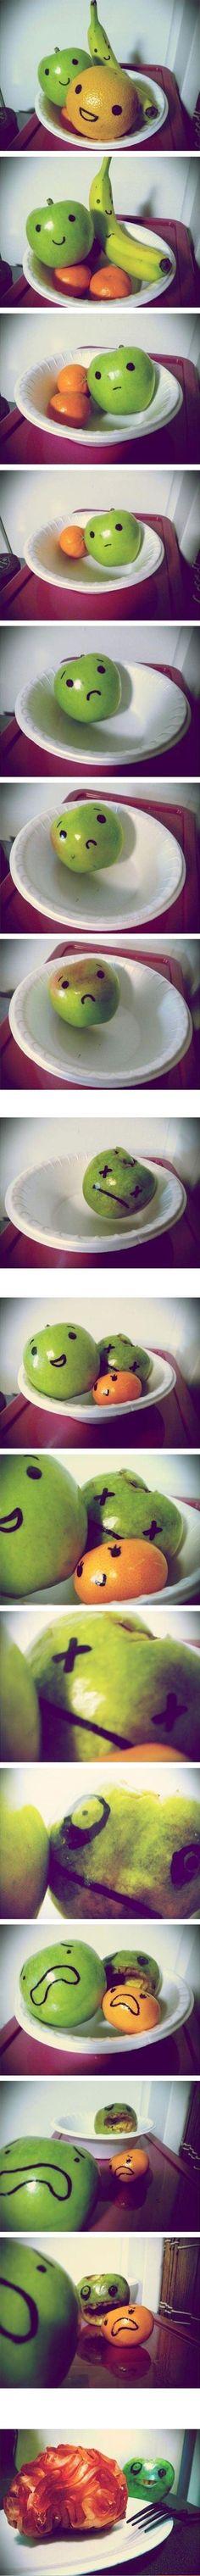 Fruit Zombies - Imgur